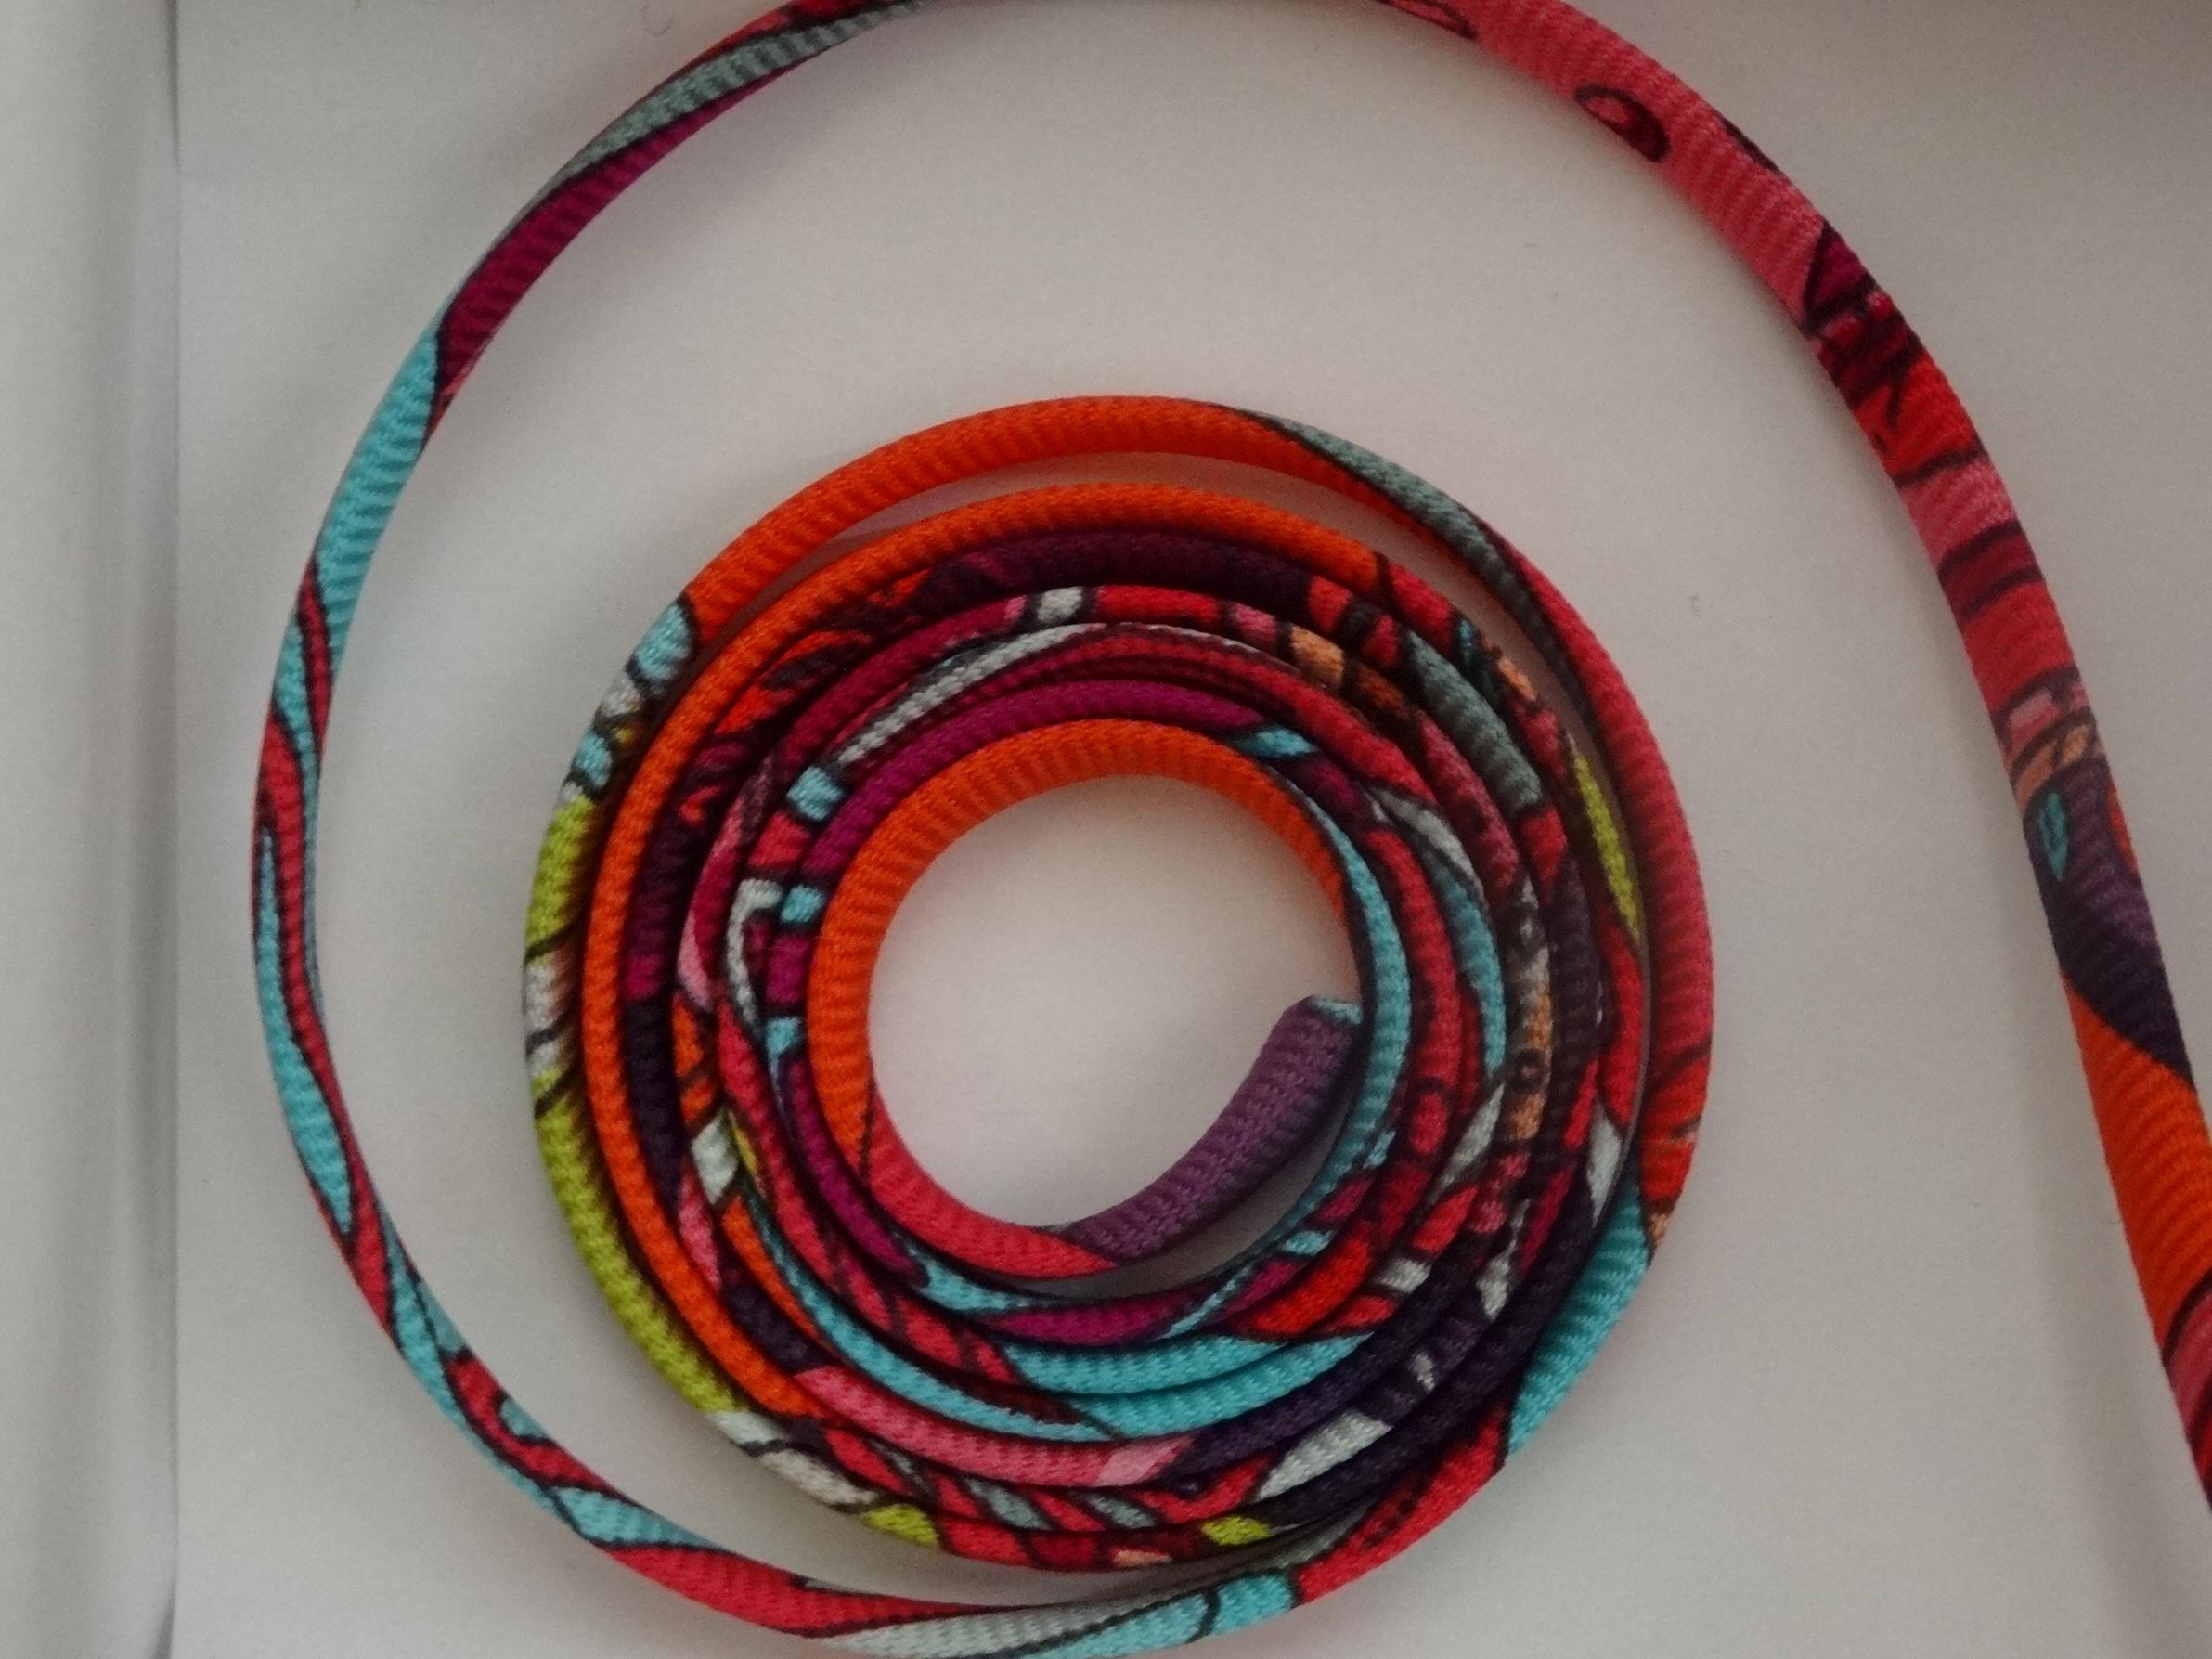 DSC03198 Hermes Silk Spaghetti HappyFace313